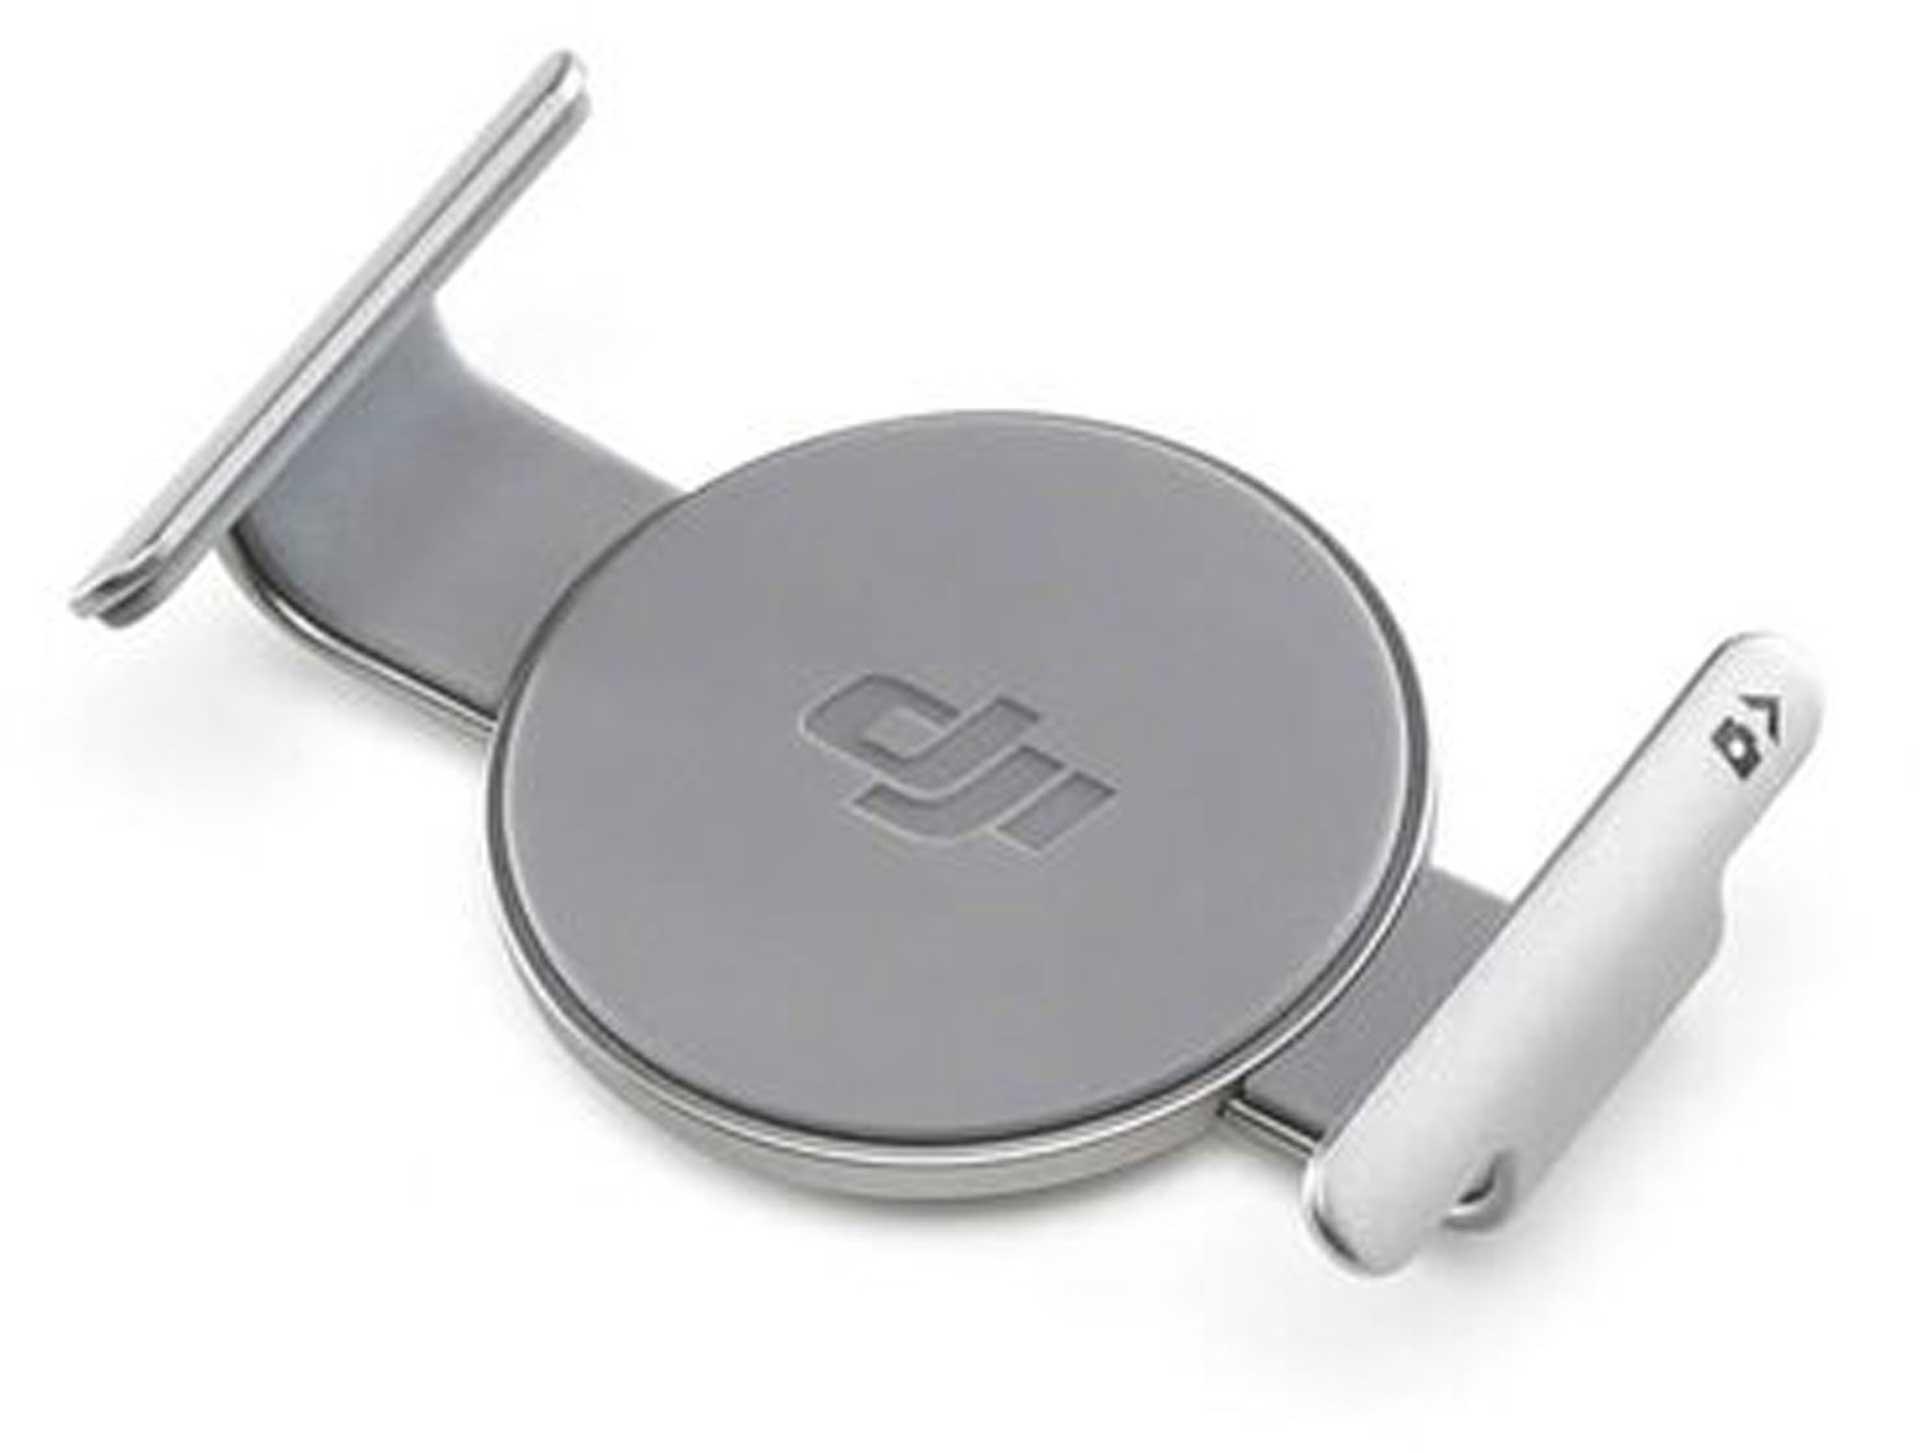 DJI OM 4 - Magnetische Handyklemme